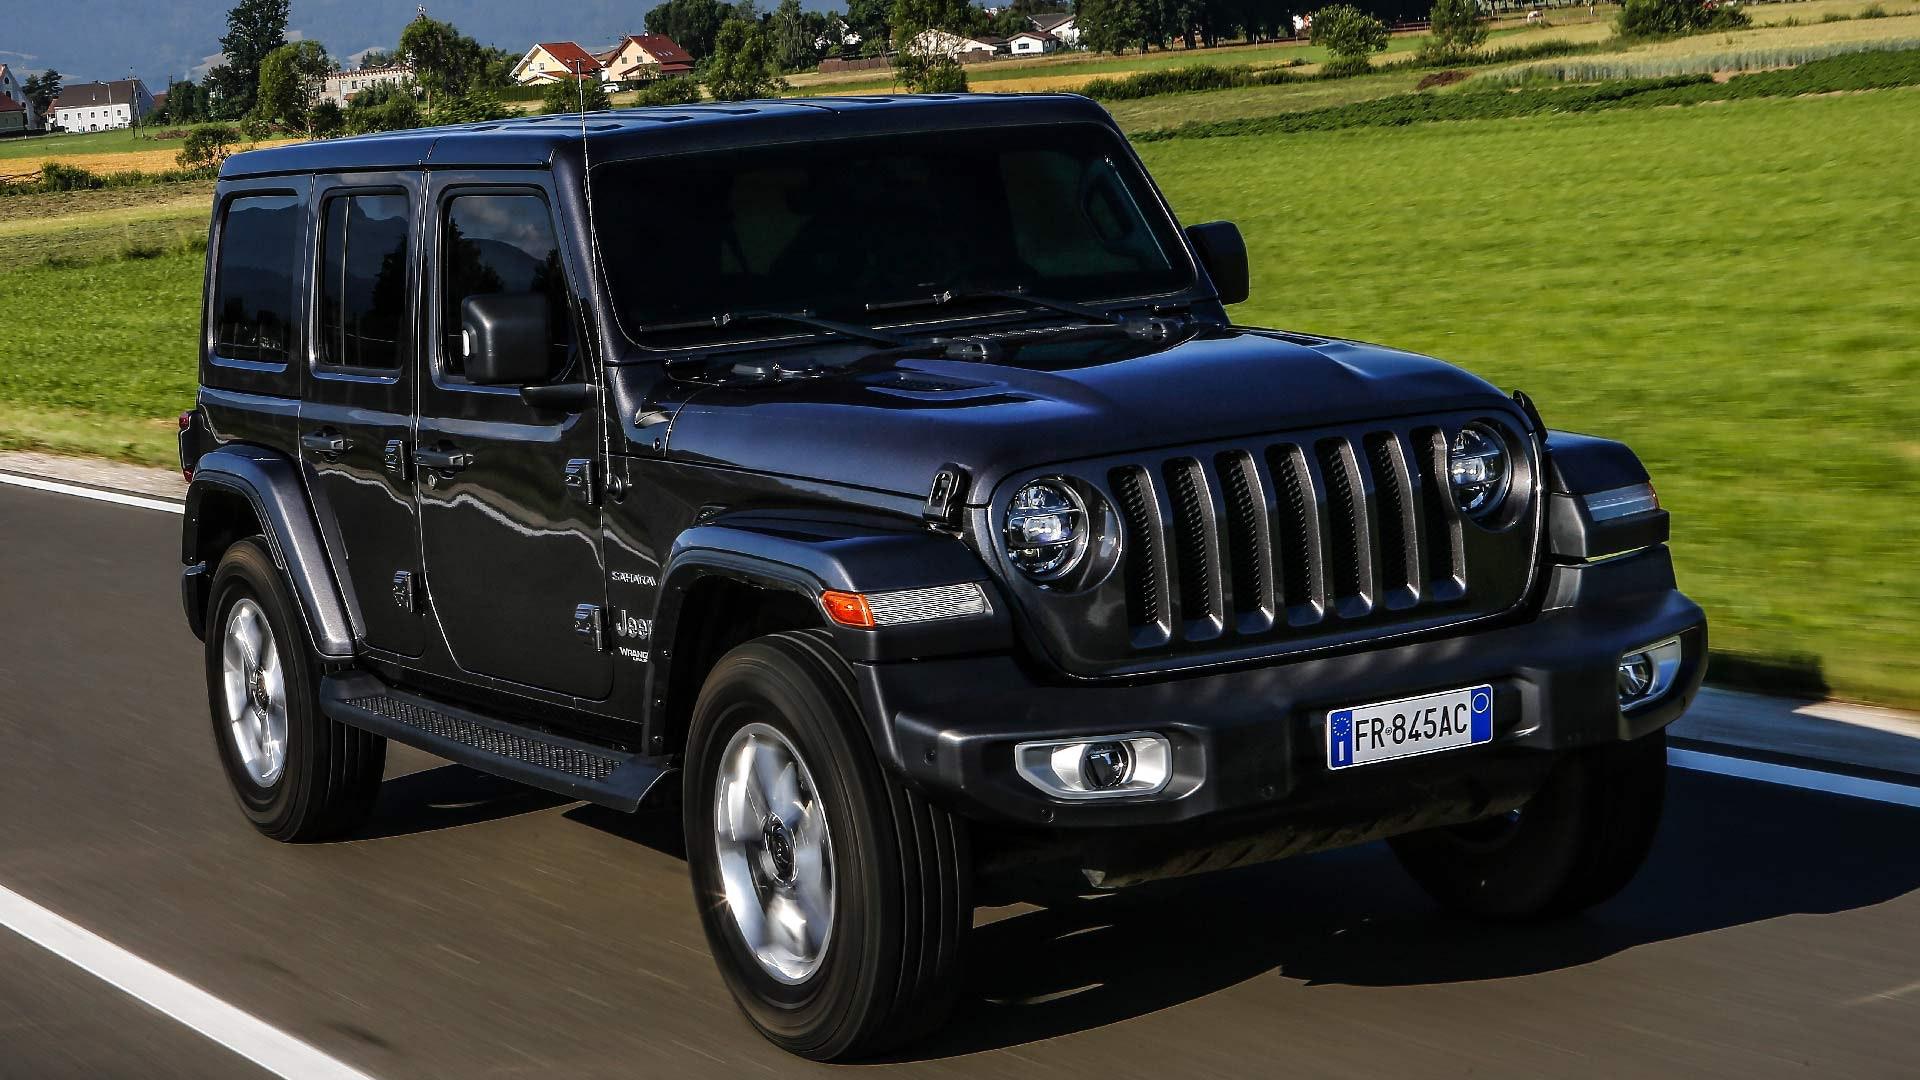 Jeep Wrangler sort front